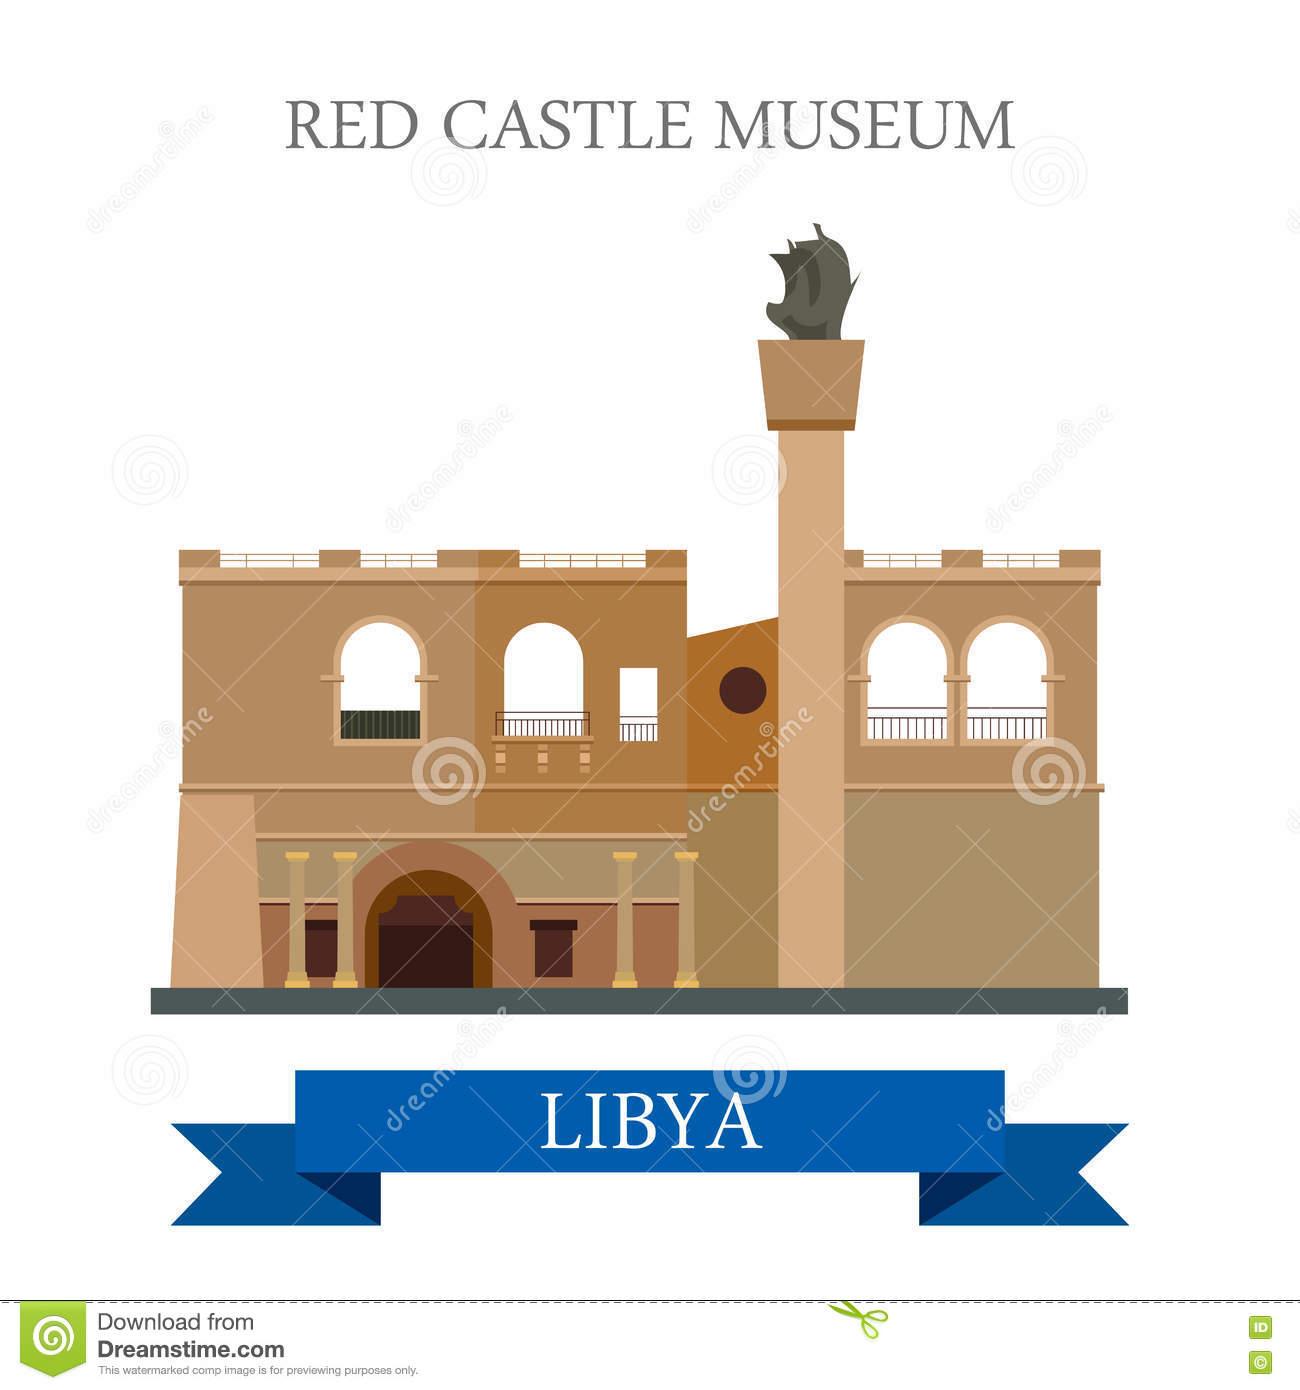 Red Castle Museum In Libya Vector Illustration Stock Vector.